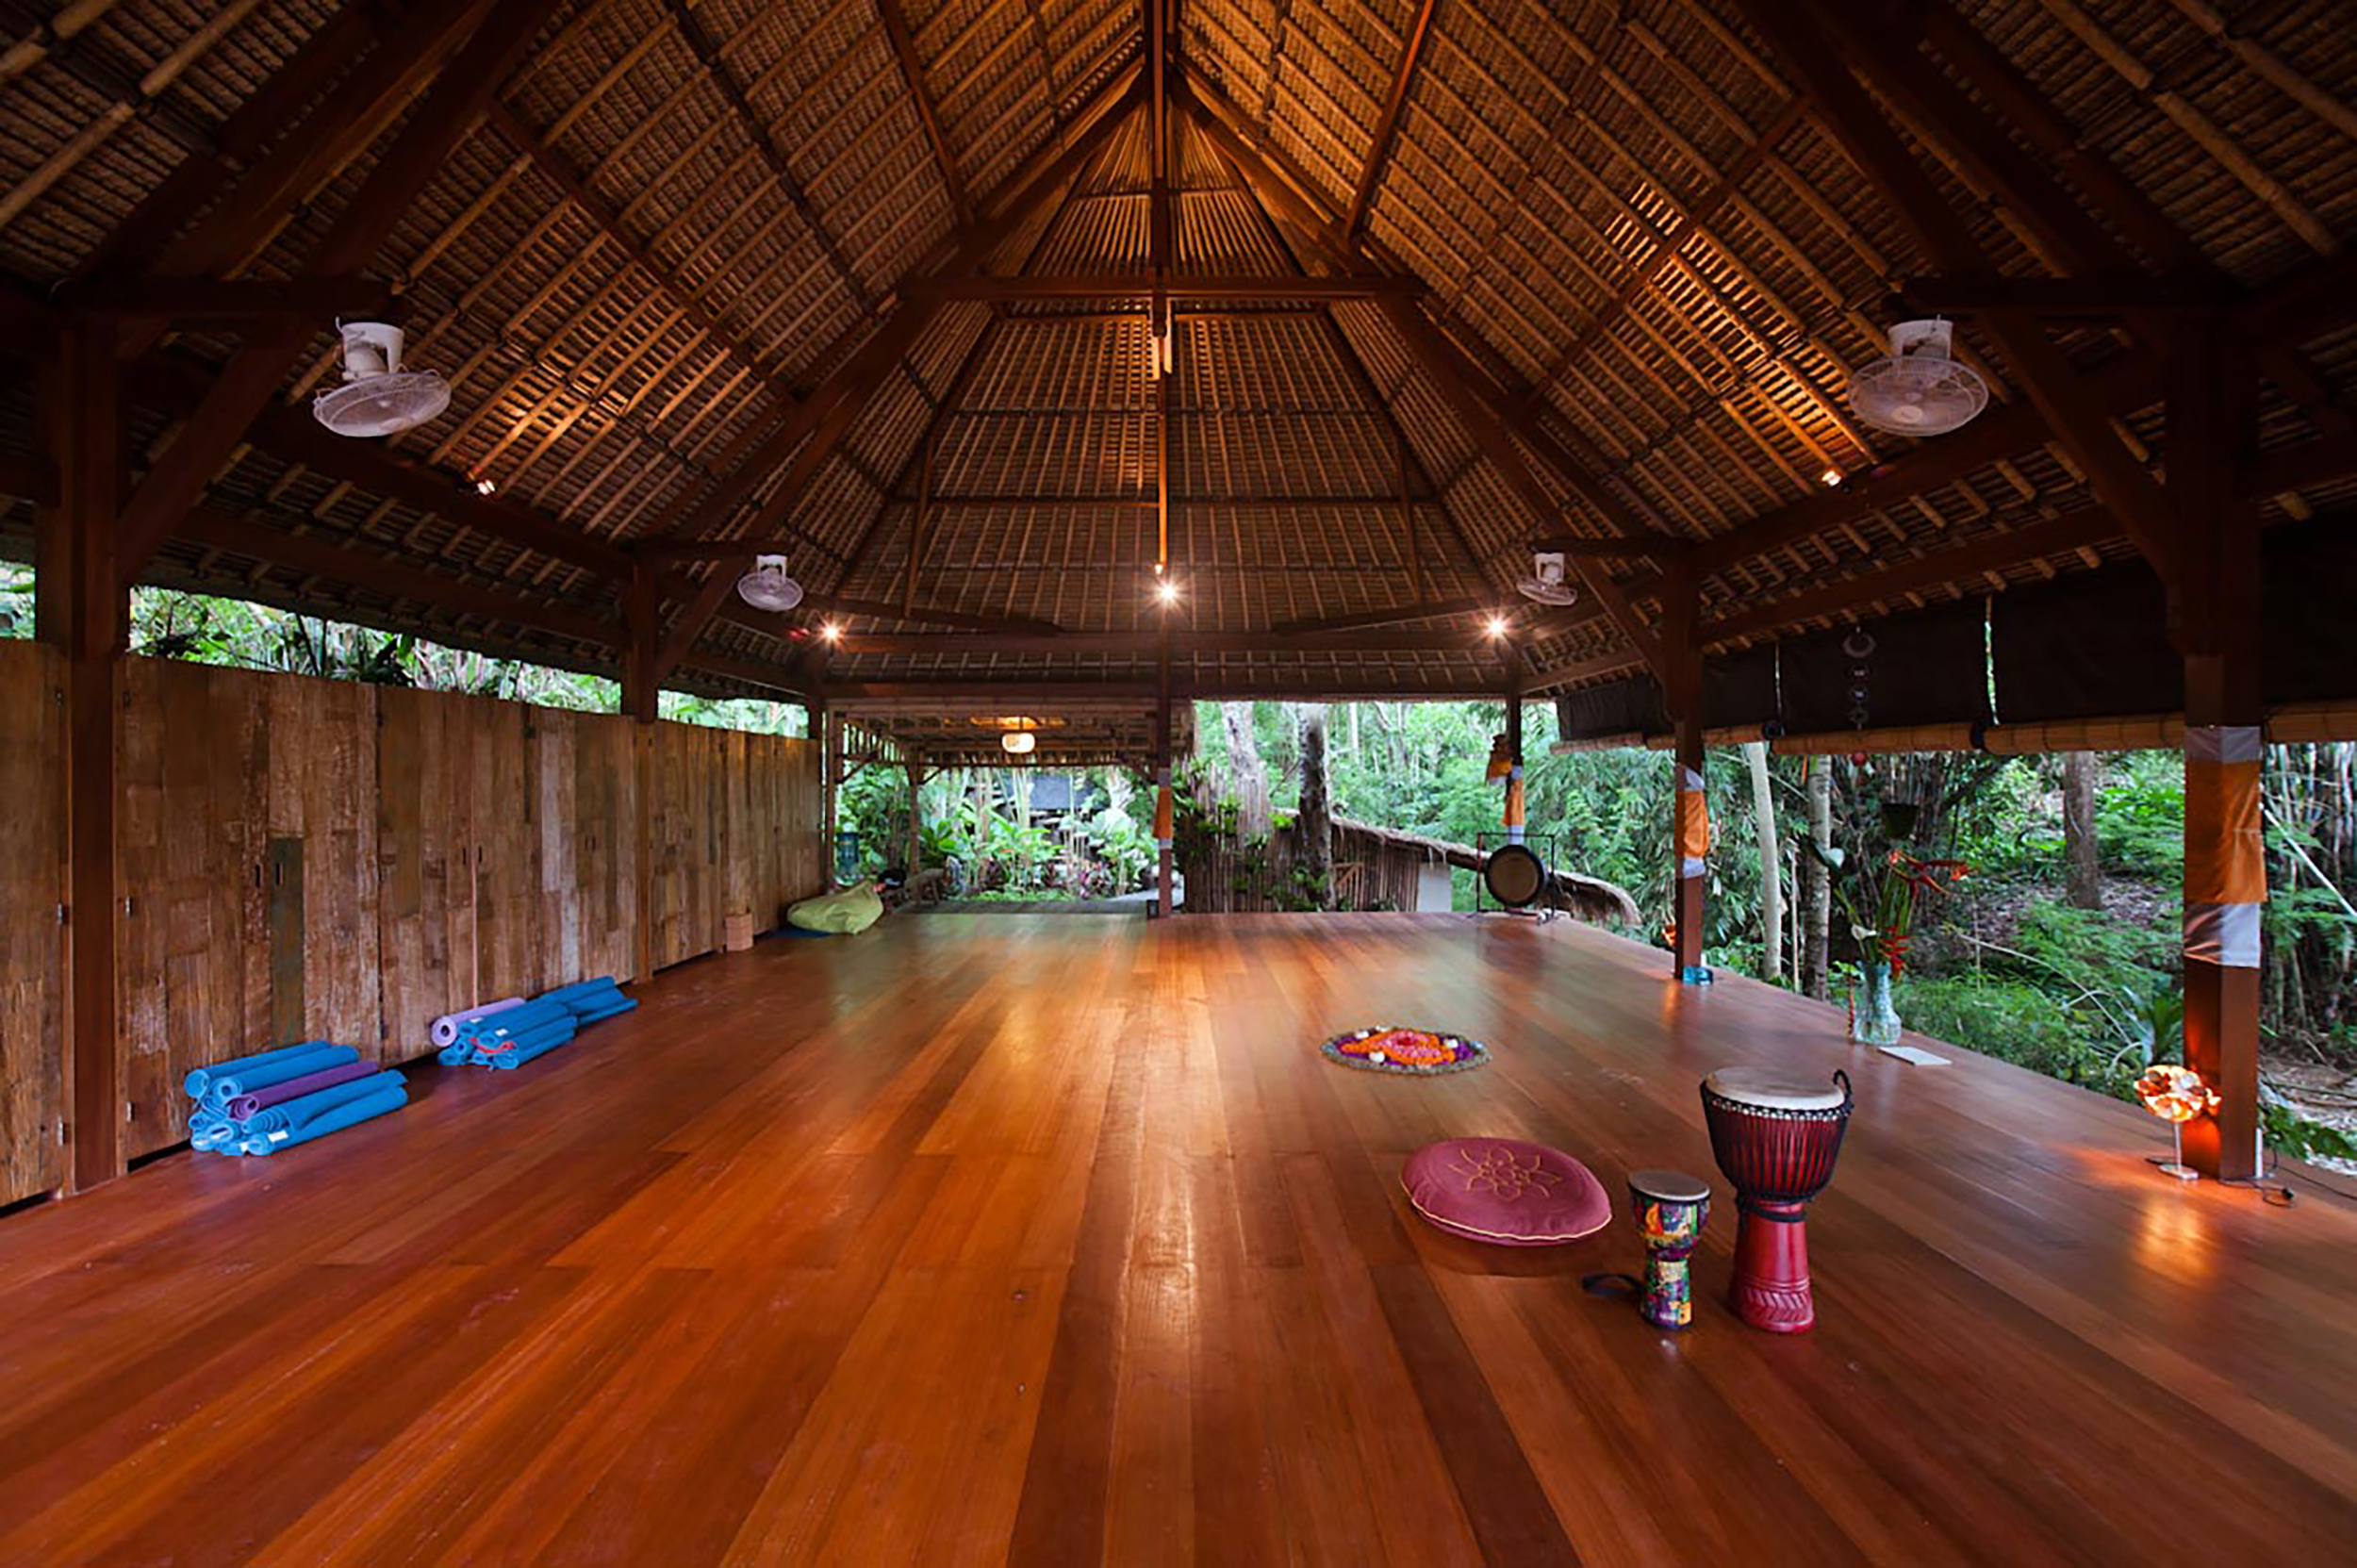 Naya Yoga - 039.jpg